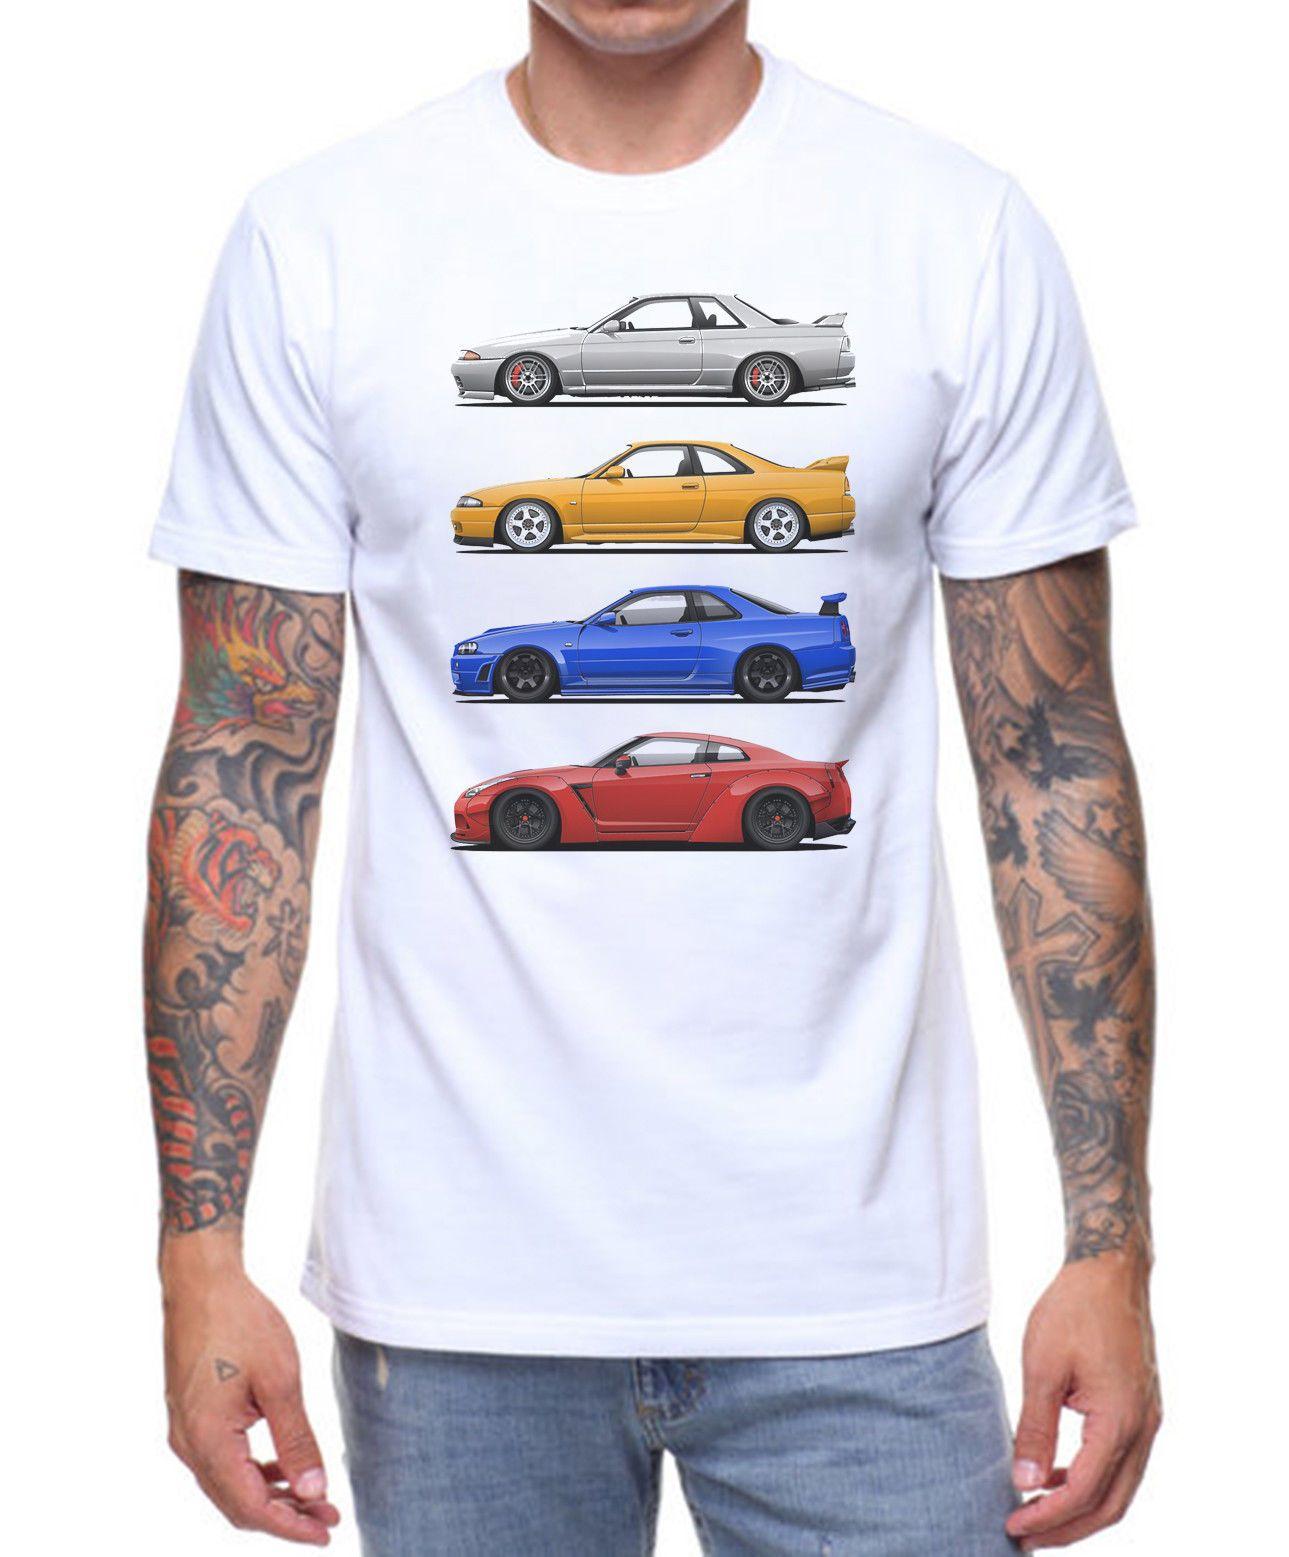 Nissan Skyline T Shirt Retro Vintage Car Artwork Birthday Present